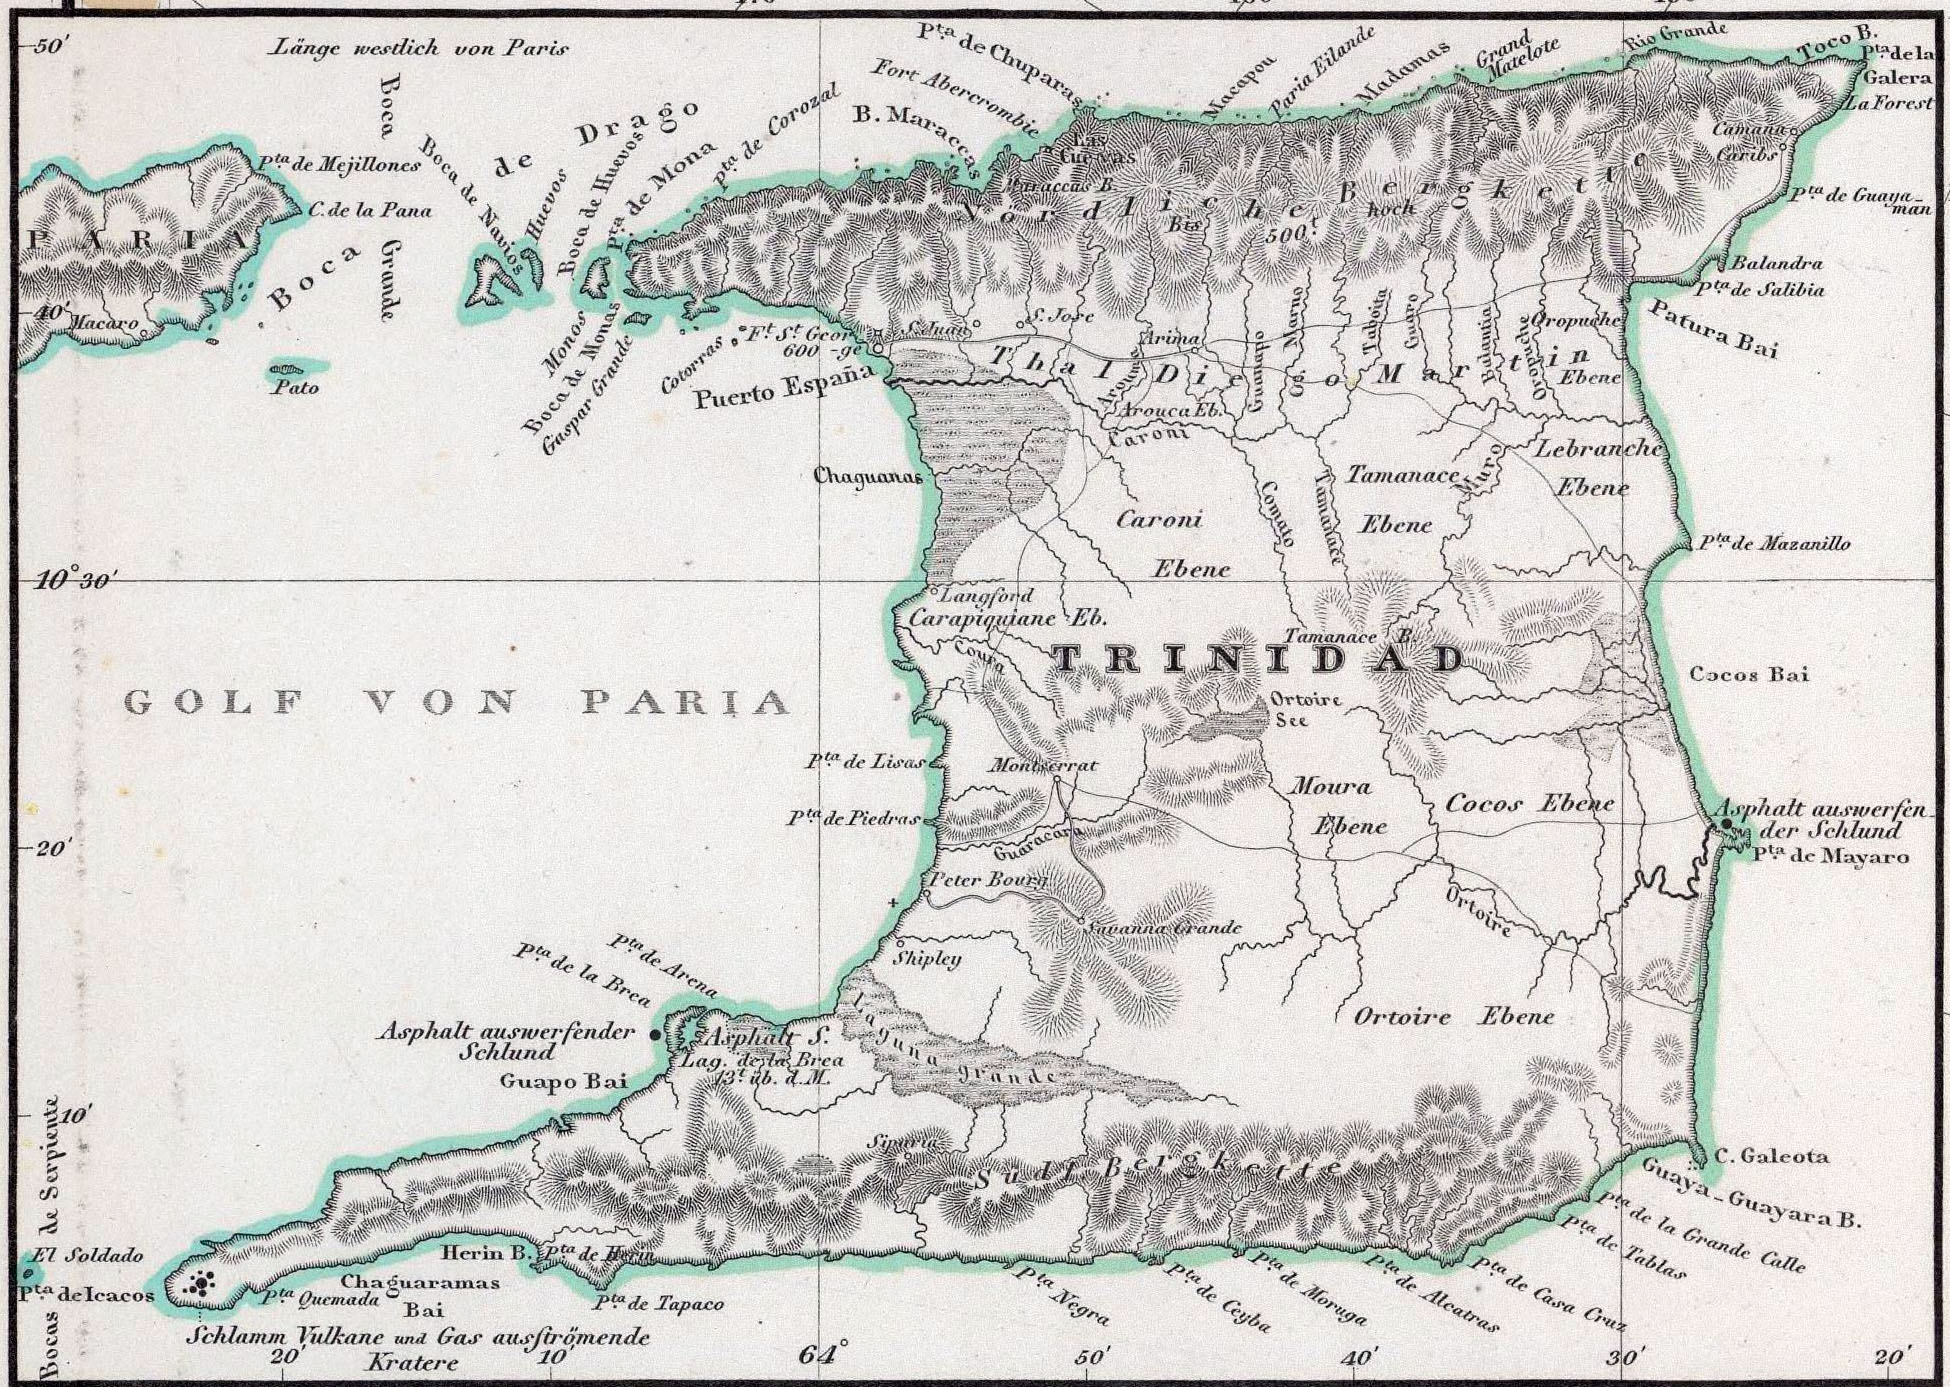 1842maptrinidad Trinidad Map Of Counties on washington map of counties, united states map of counties, kenya map of counties, taiwan map of counties, new mexico map of counties, florida map of counties, trinidad tobago map of wi, jamaica map of counties, england map of counties, ireland map of counties, los angeles map of counties,